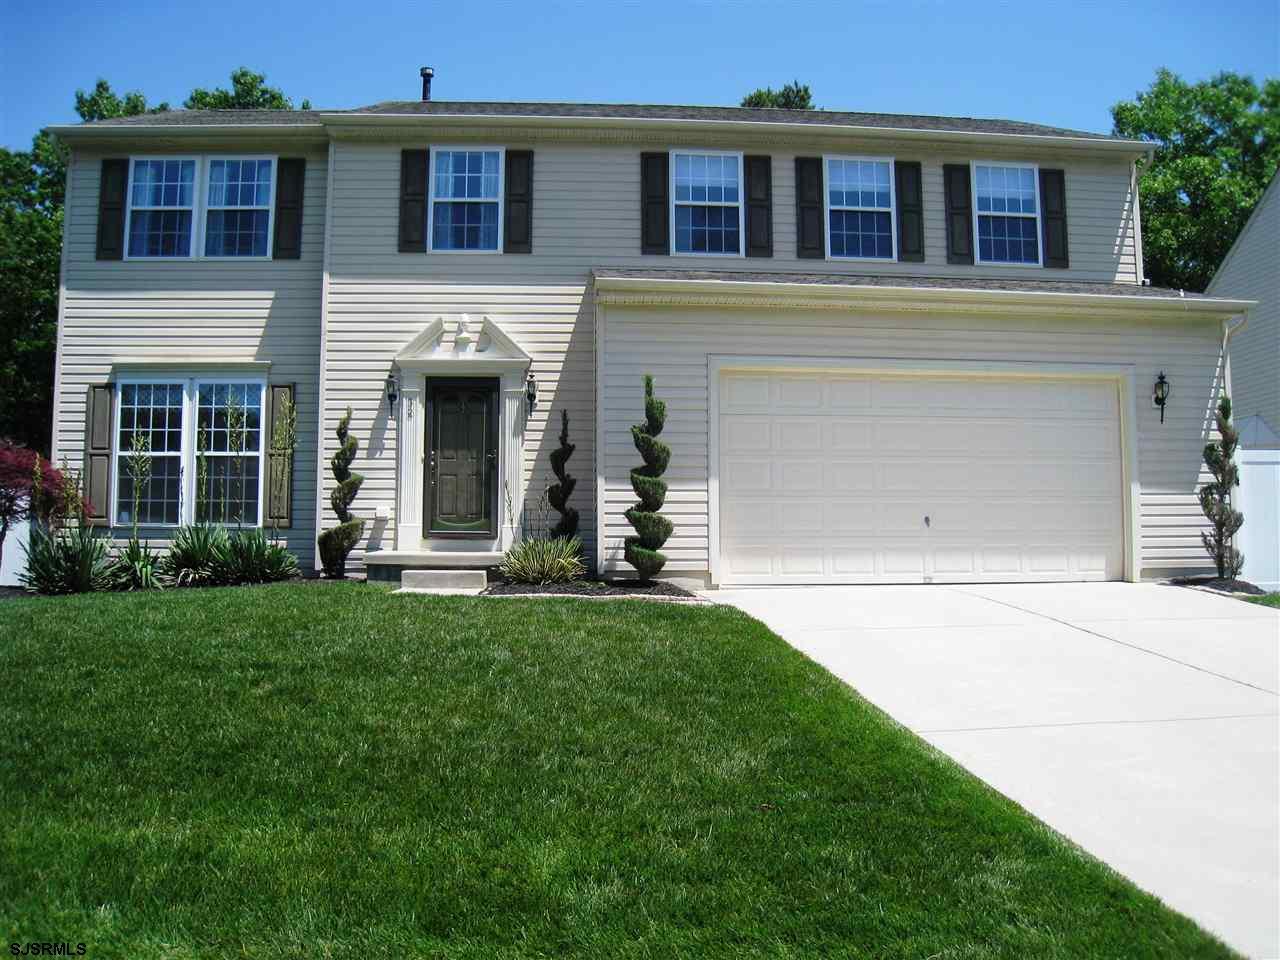 32 Cottage Rd Road, Egg Harbor Township, NJ 08234